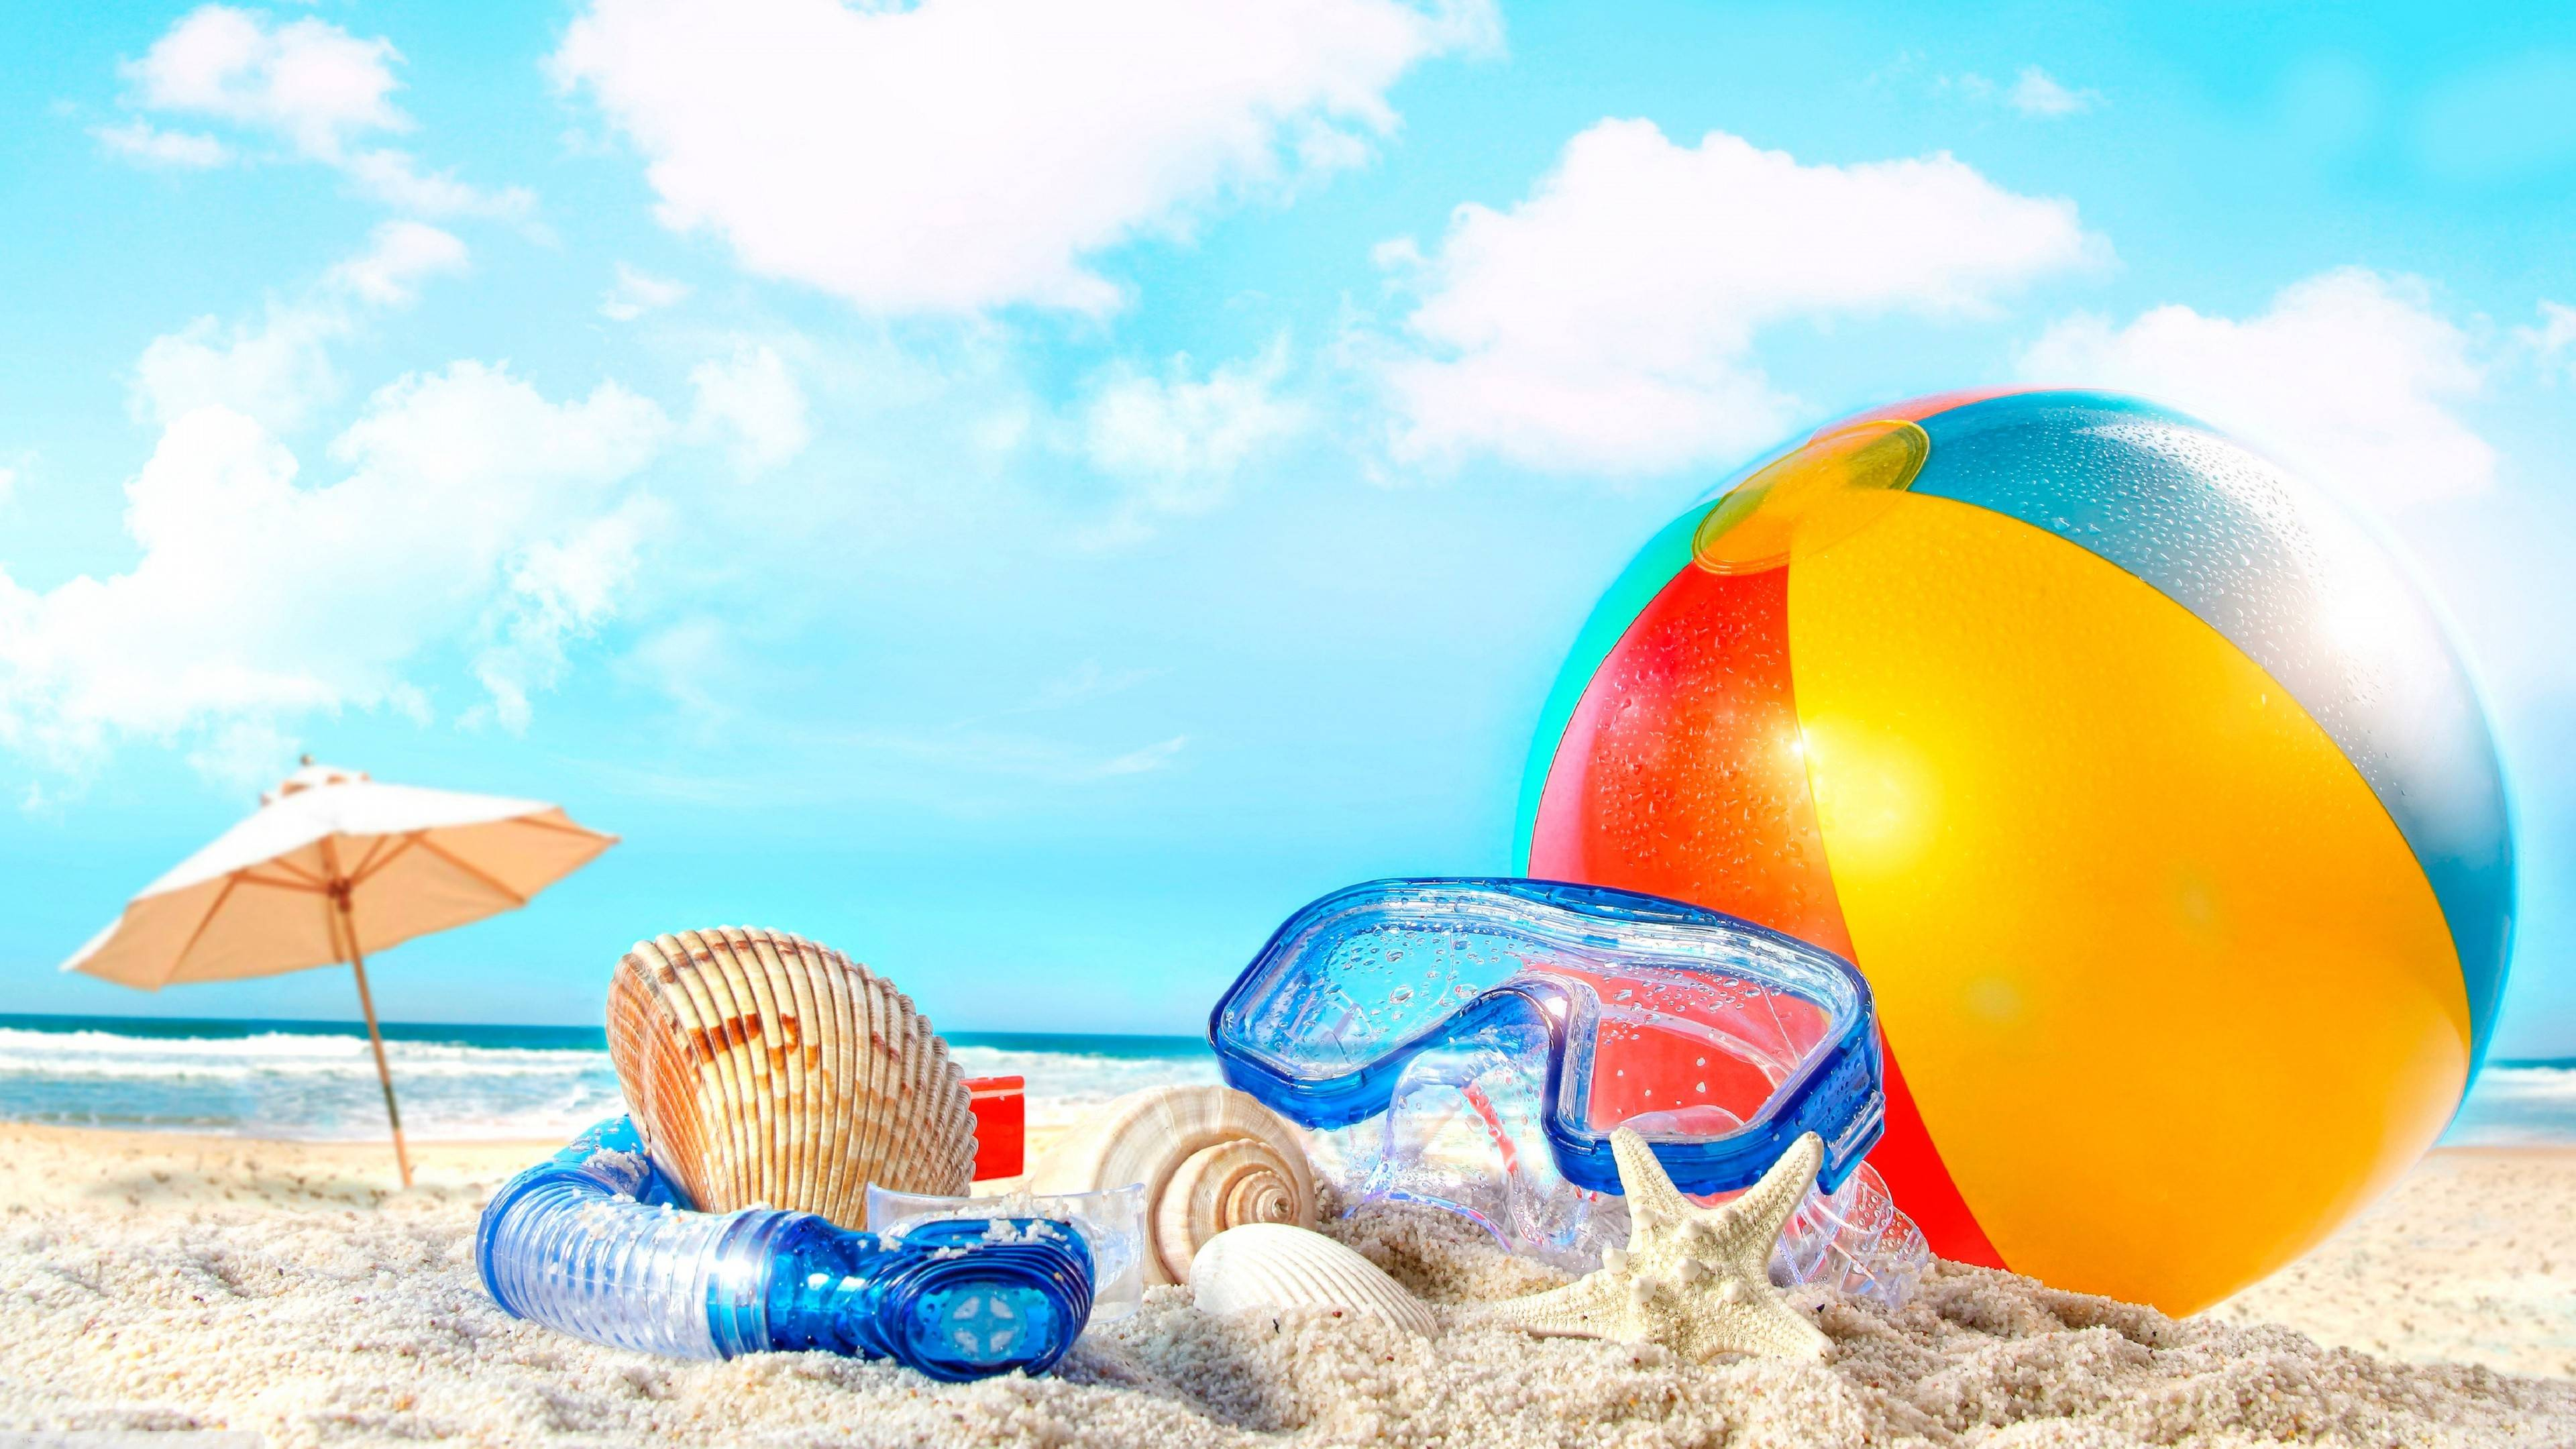 Summer Backgrounds 3840x2160